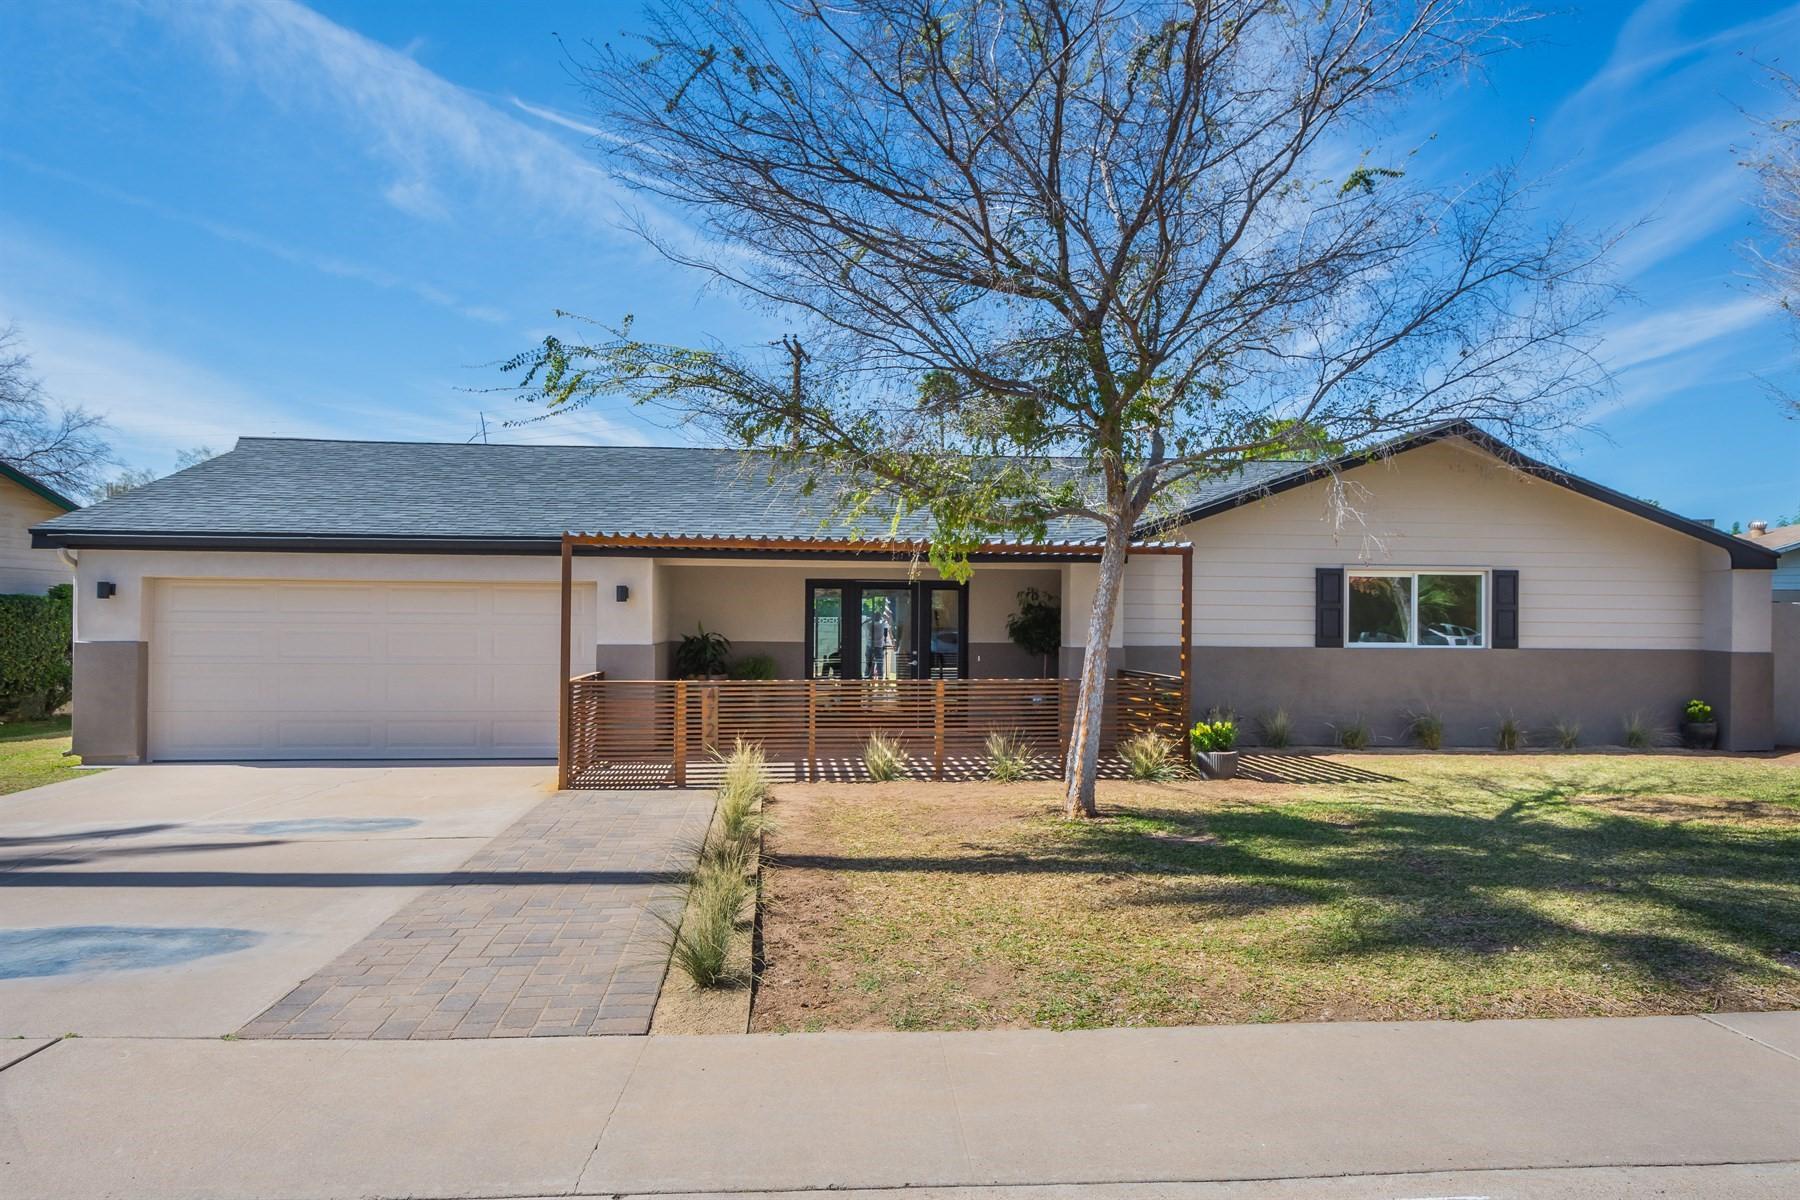 Casa Unifamiliar por un Venta en Fabulous single story home in a desirable neighborhood 4724 N 33rd Pl Phoenix, Arizona, 85018 Estados Unidos